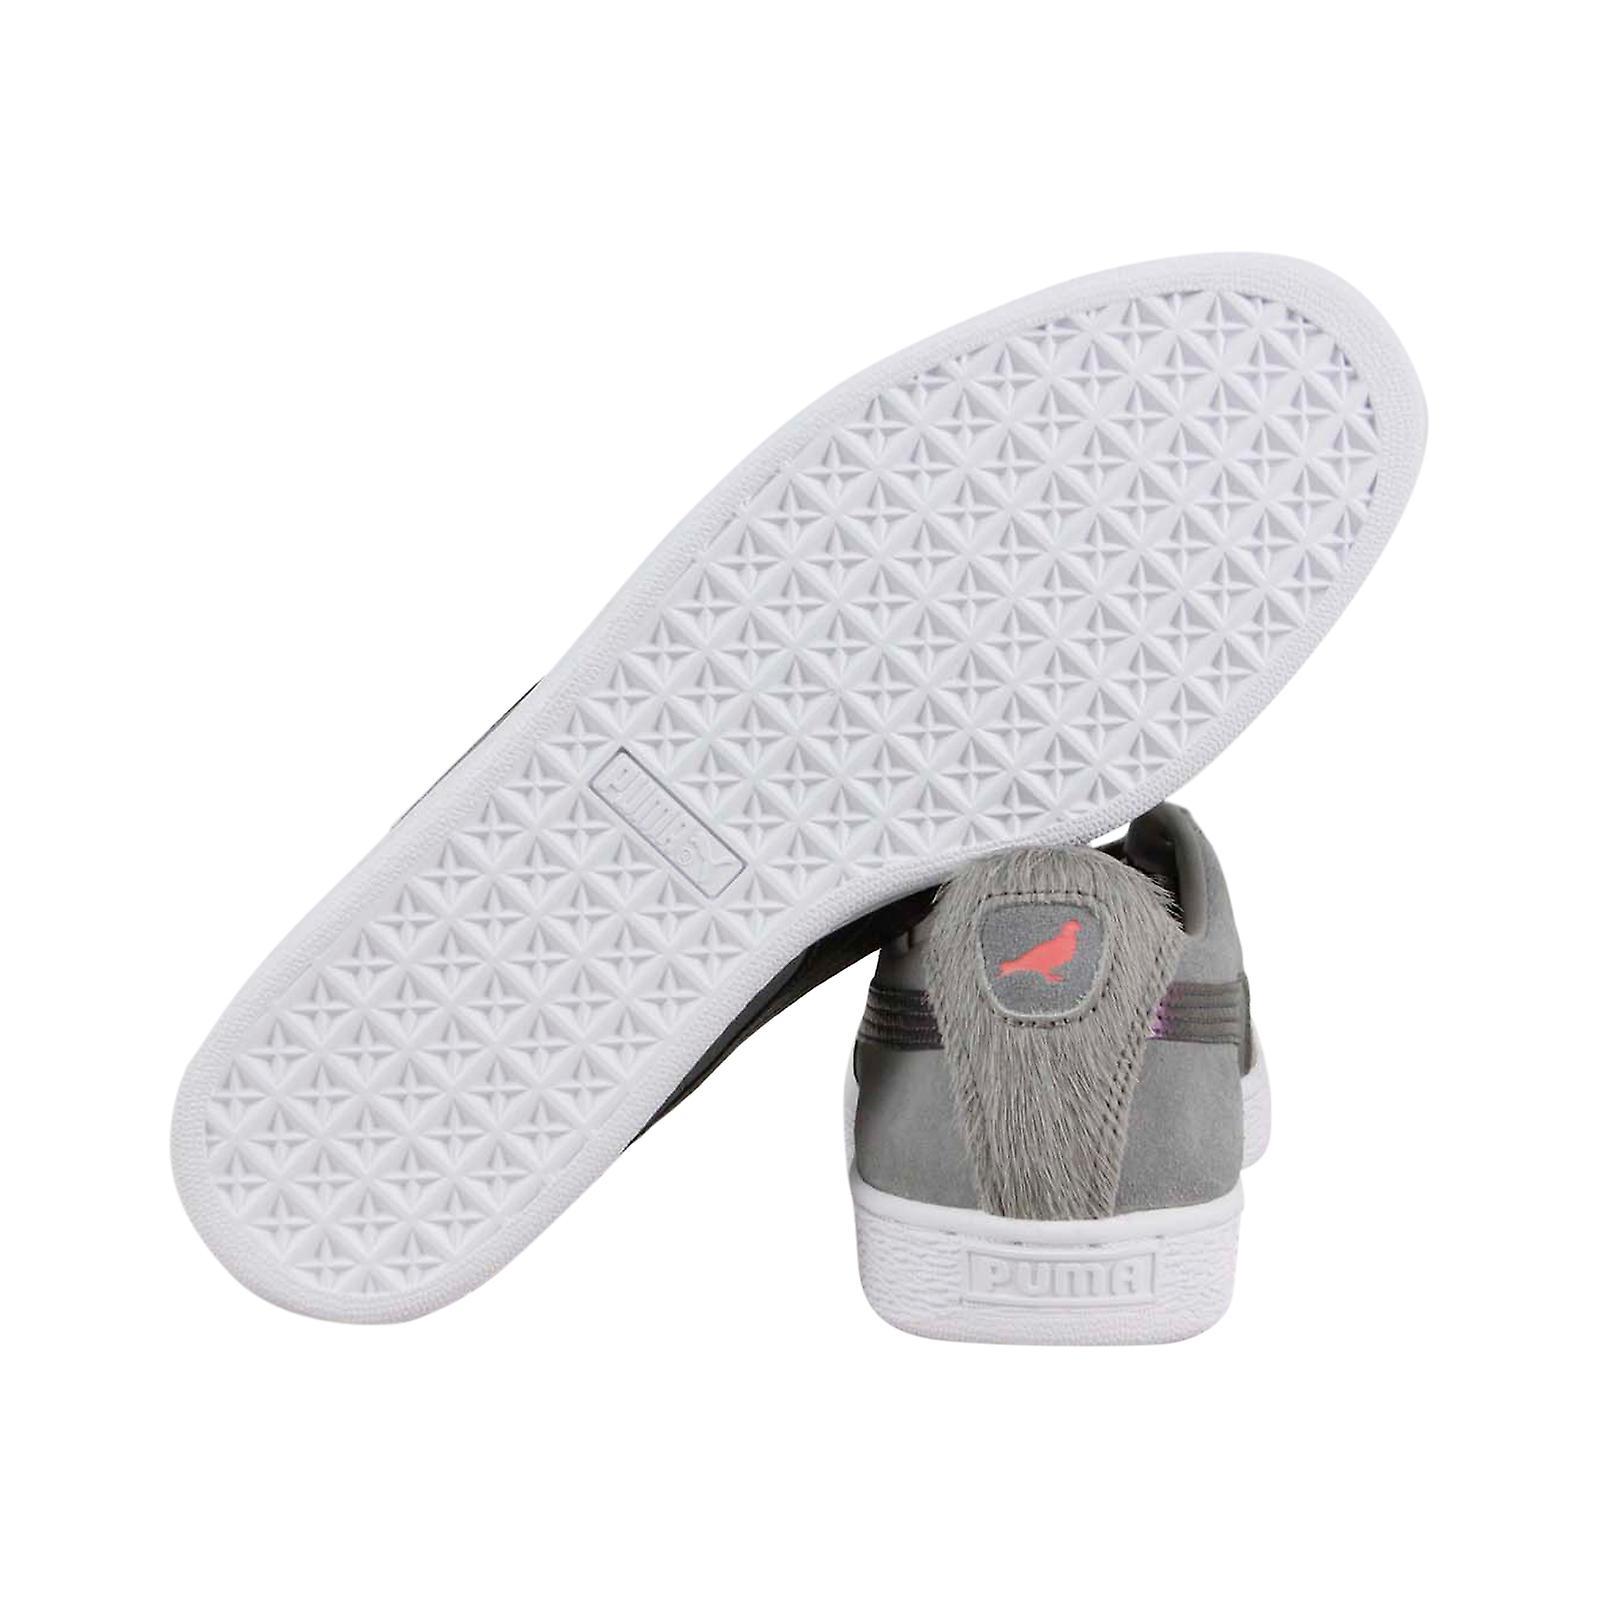 Puma Suede Classic X stift Pigeon menns grå lav topp joggesko sko